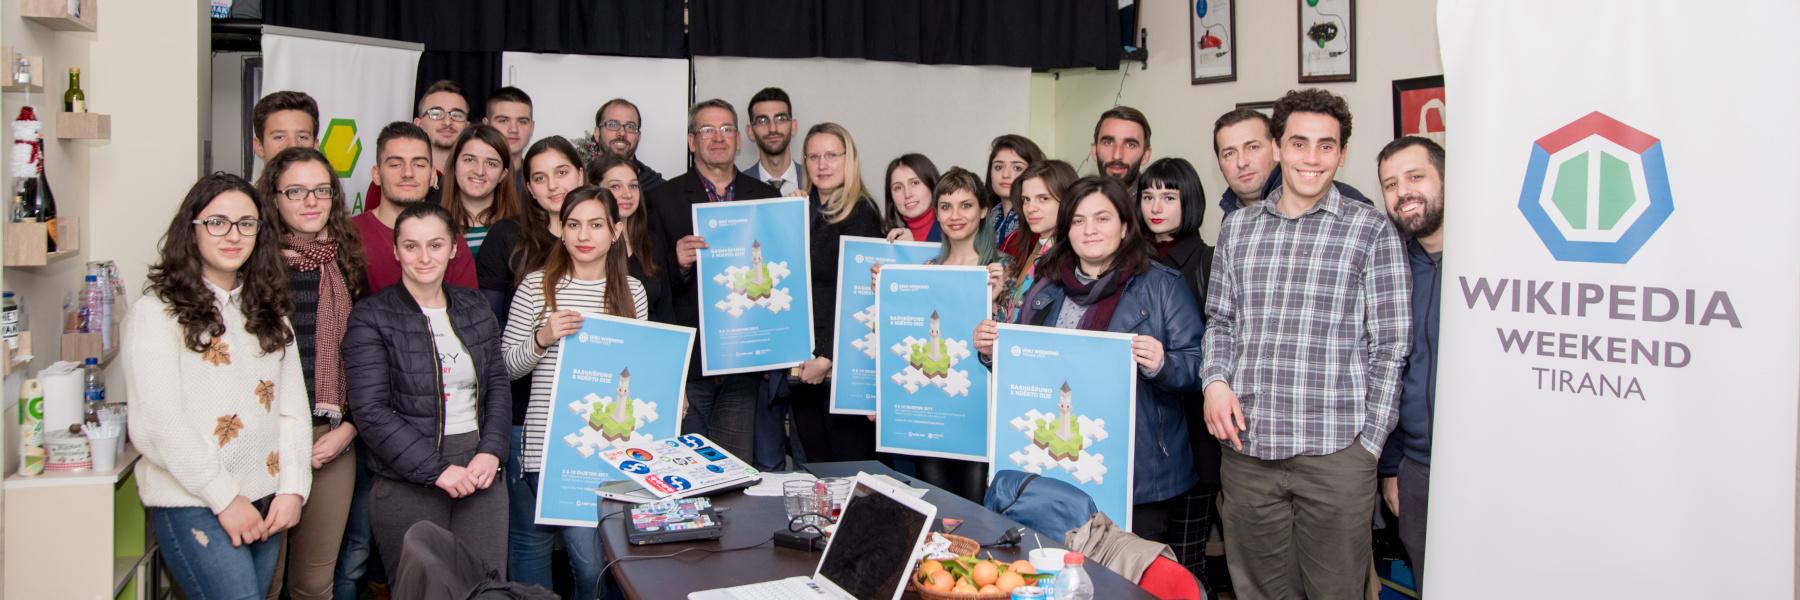 Wiki Weekend Tirana 2018 – Open Labs Hackerspace